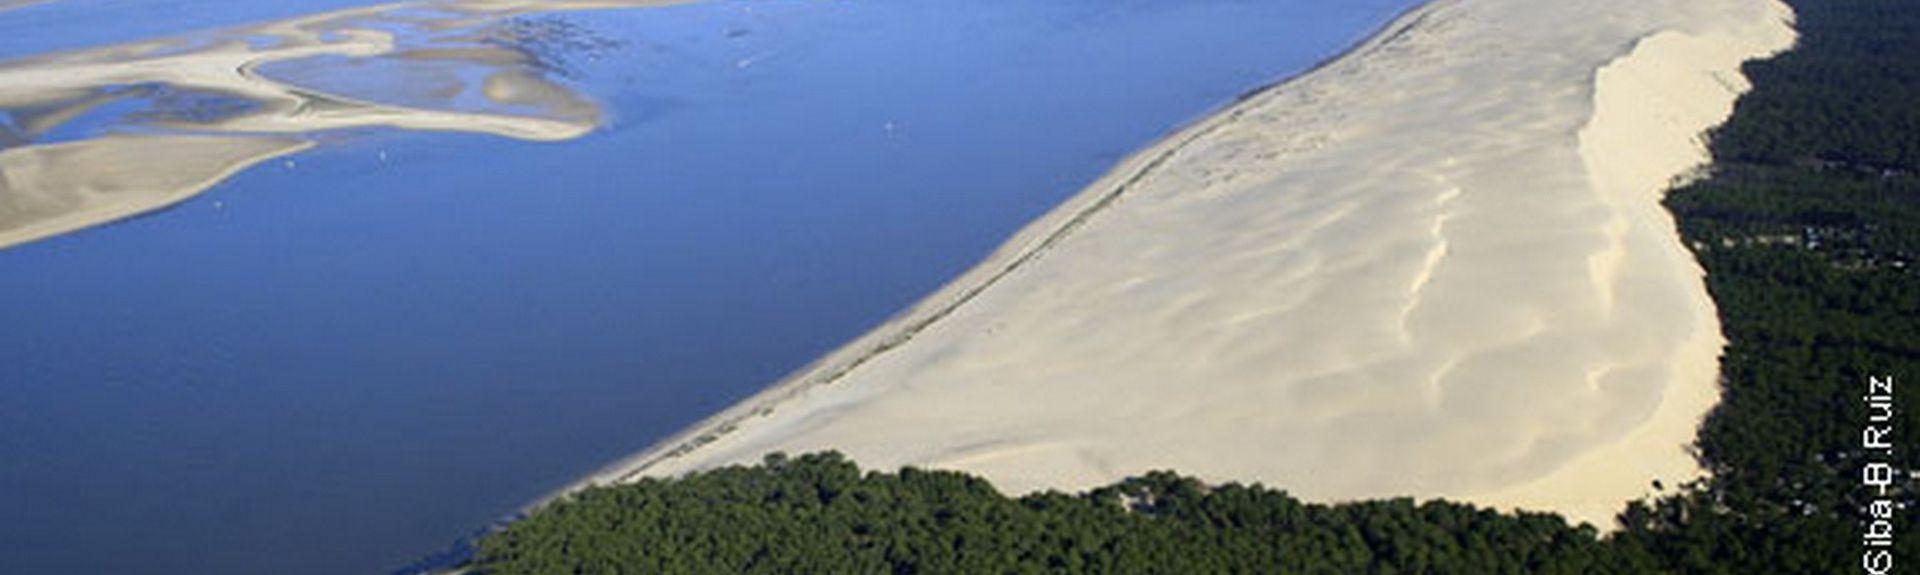 Tauriac, Gironde (département), France